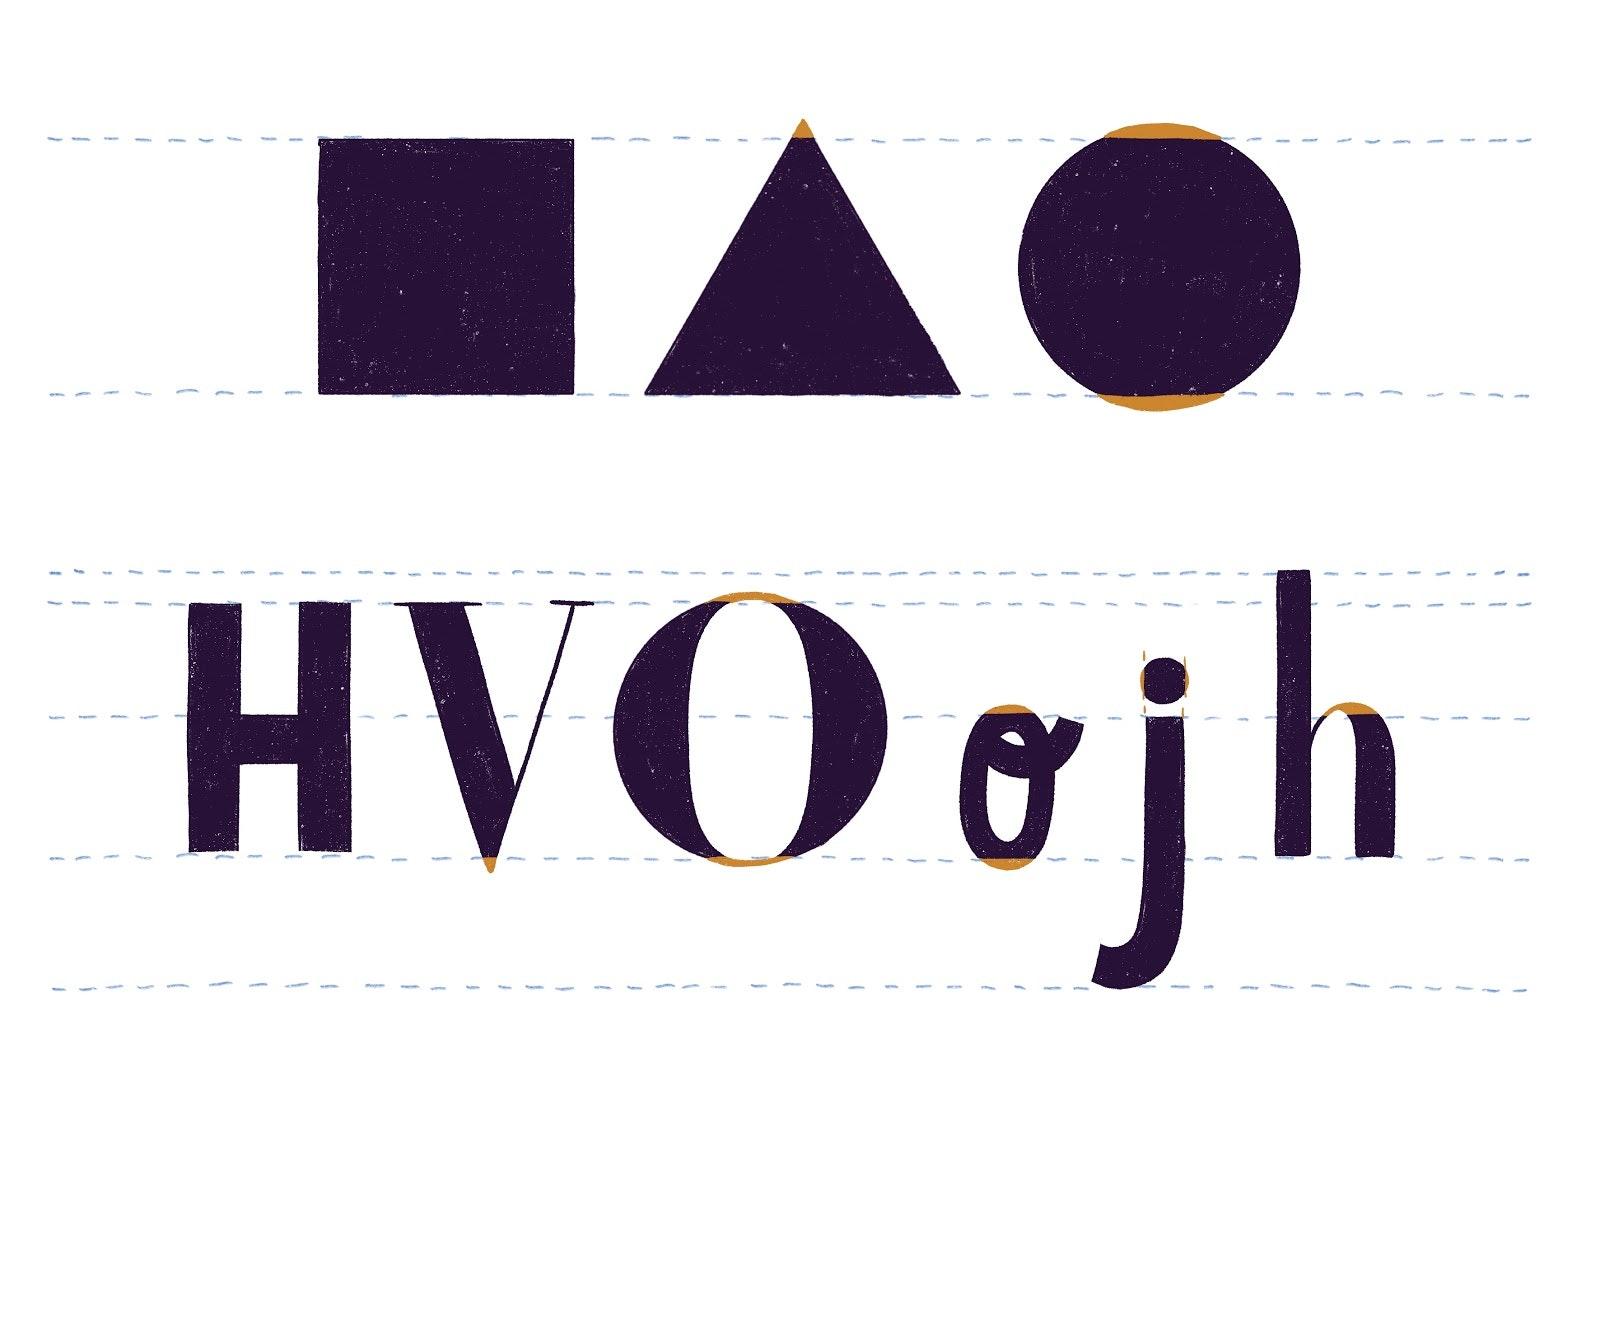 Letter sizes various